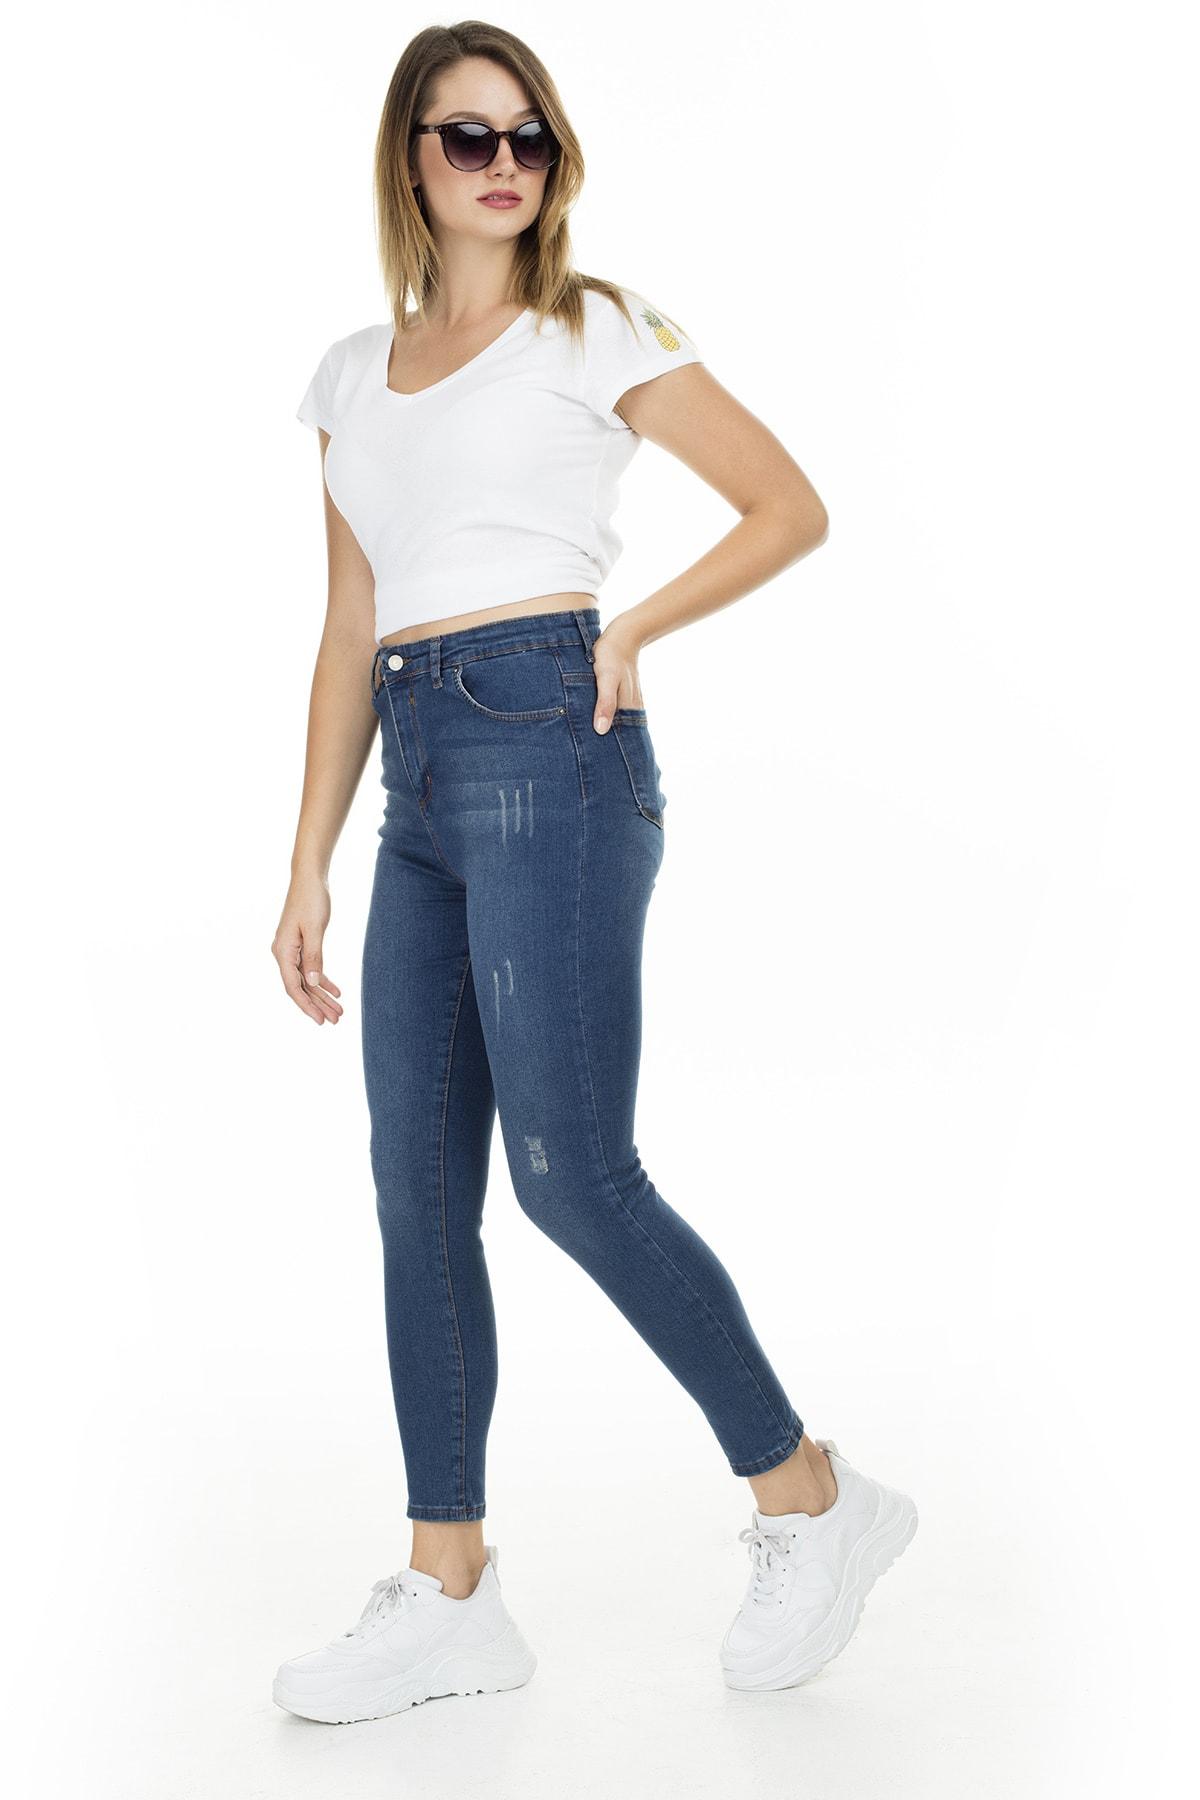 Lela Kadın Yüksek Bel Skinny Jeans Kot Pantolon 58713266